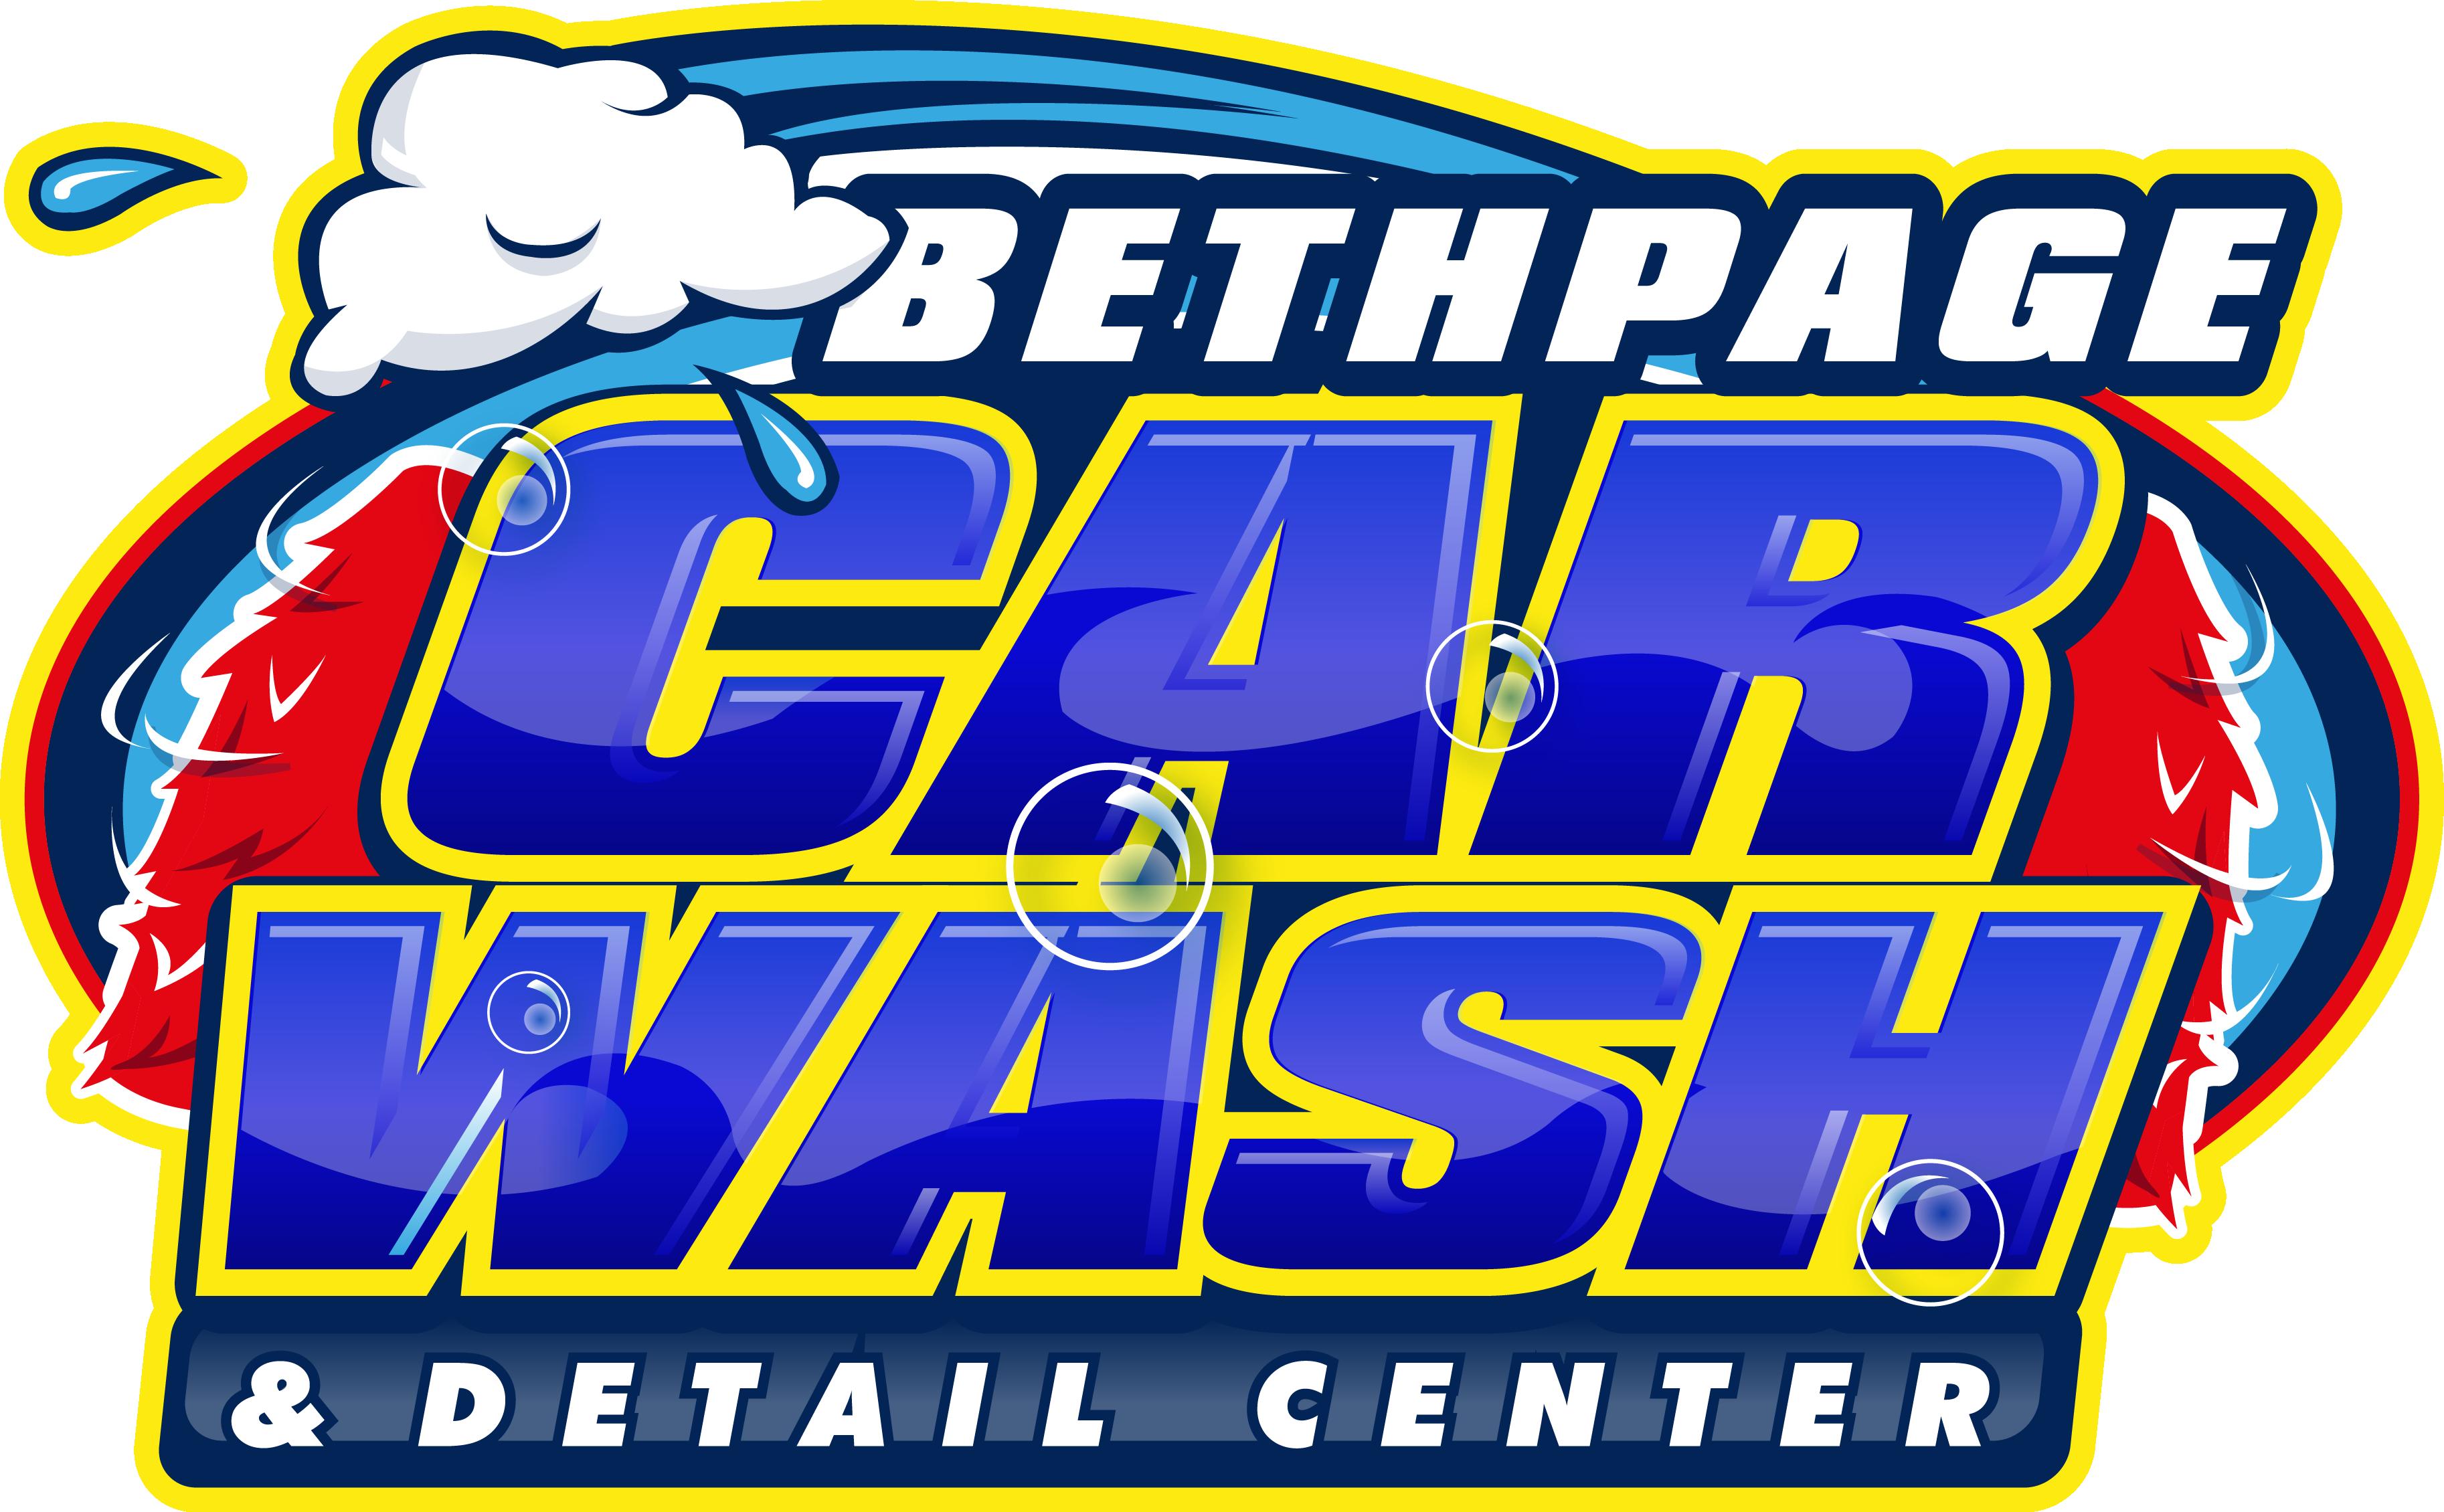 Car Wash Logo Vector At Getdrawings Com Free For Personal Use Car